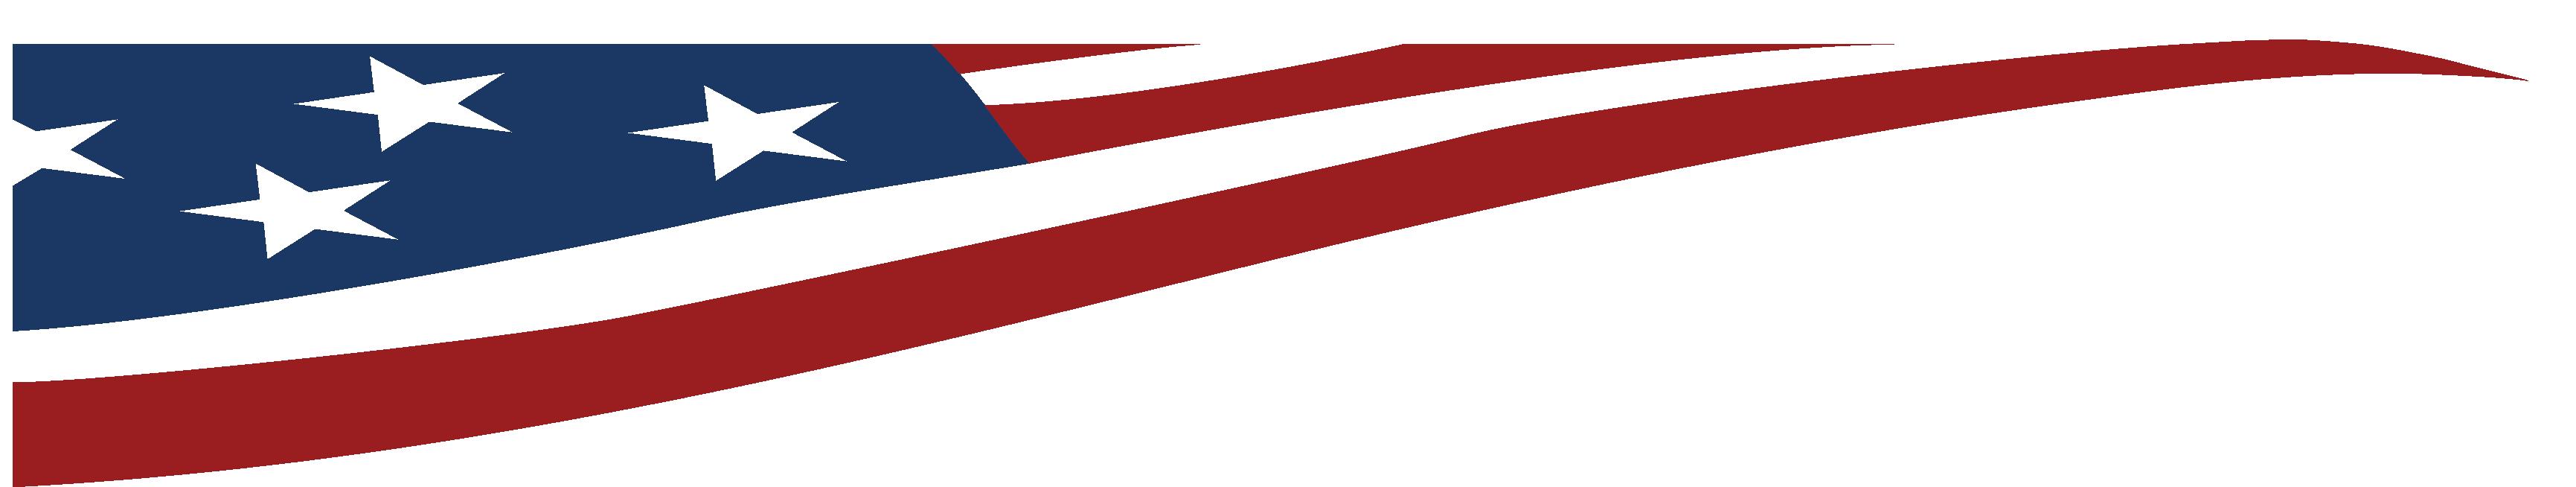 patriotic-banner-8